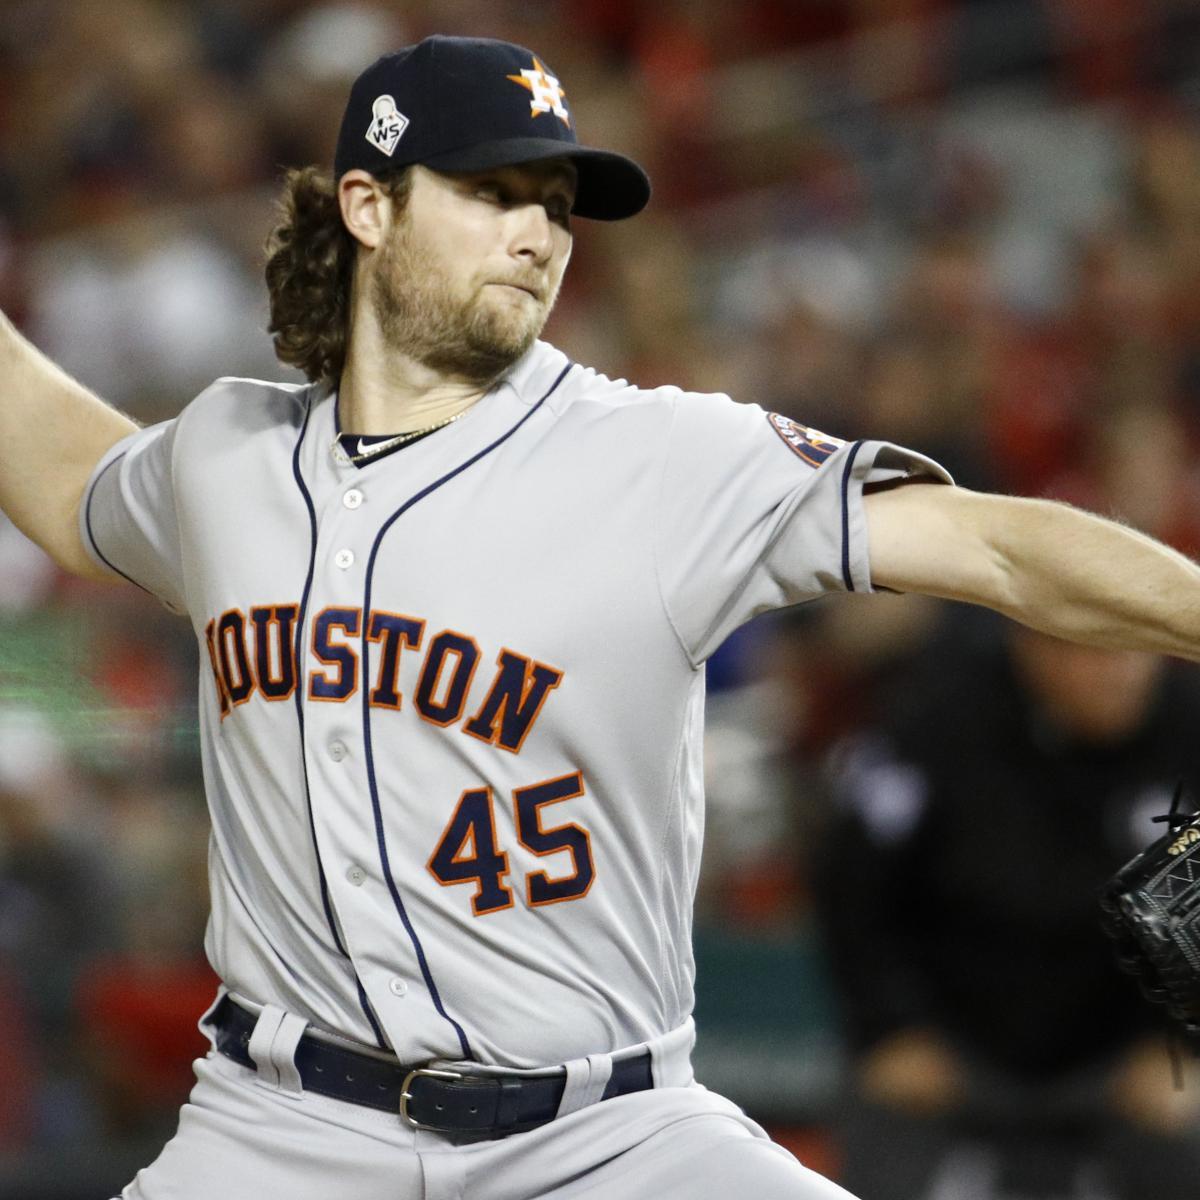 Gerrit Cole Rumors: 'Mystery Team' Linked amid Yankees, Dodgers, Angels Buzz